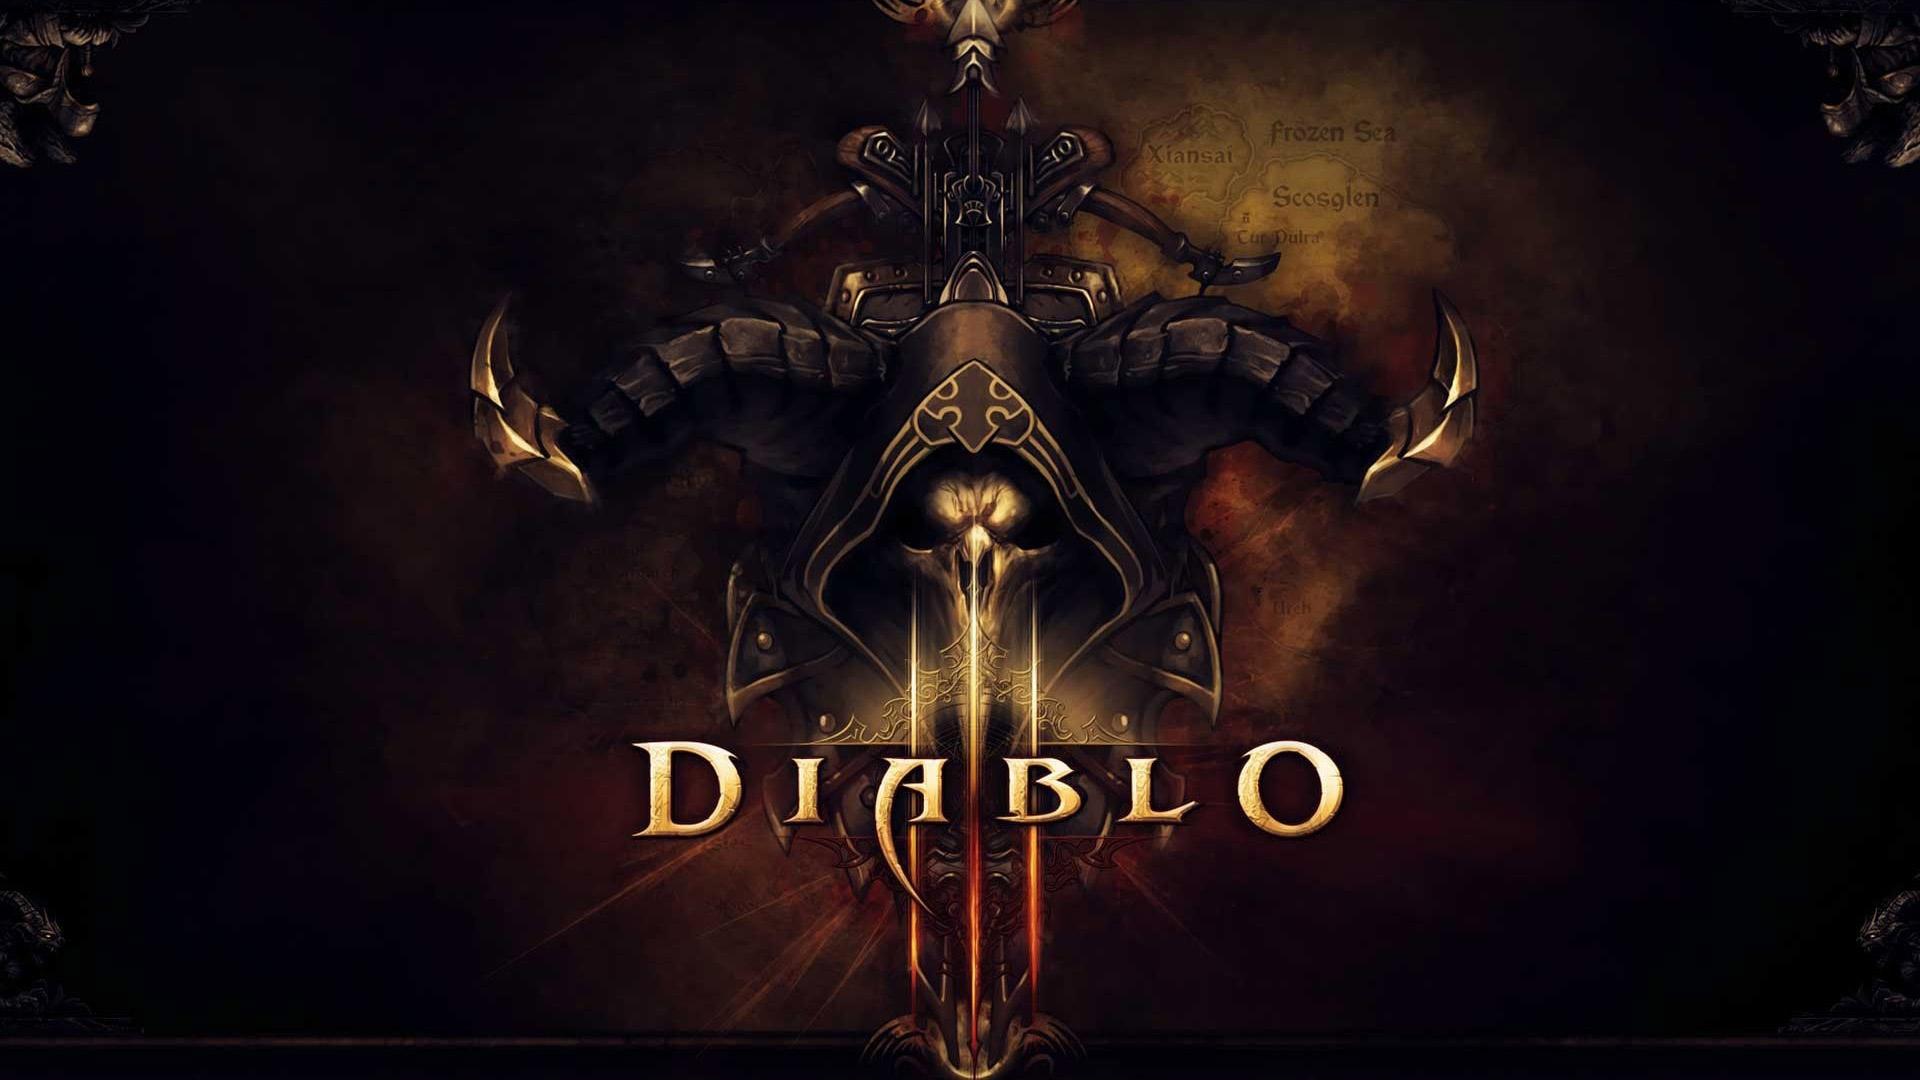 Diablo 3 wallpaper 34